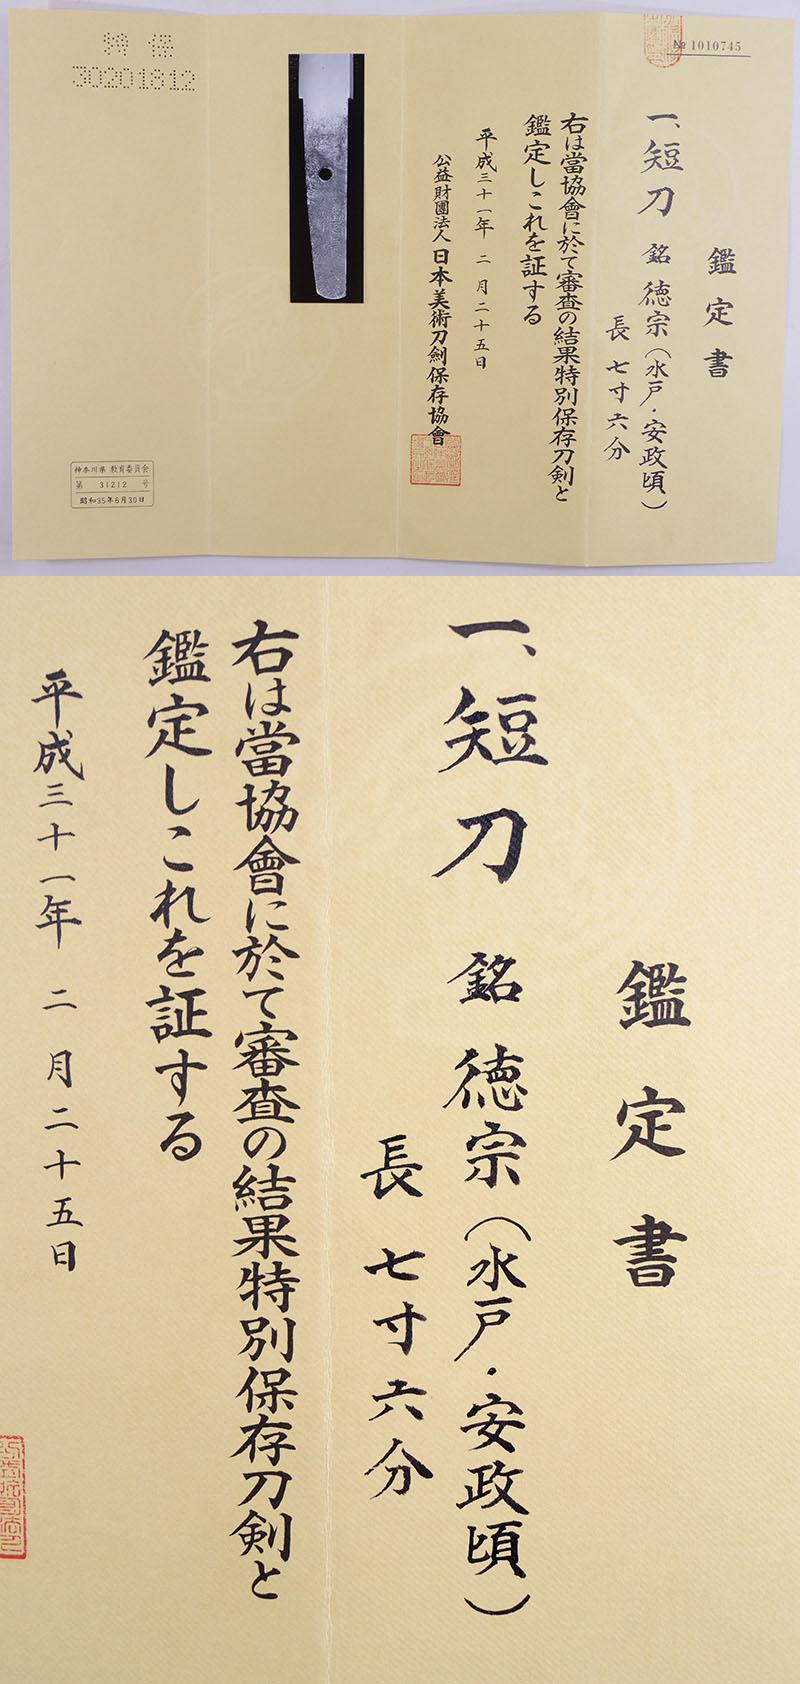 徳宗(水戸藩工・安政頃) Picture of Certificate